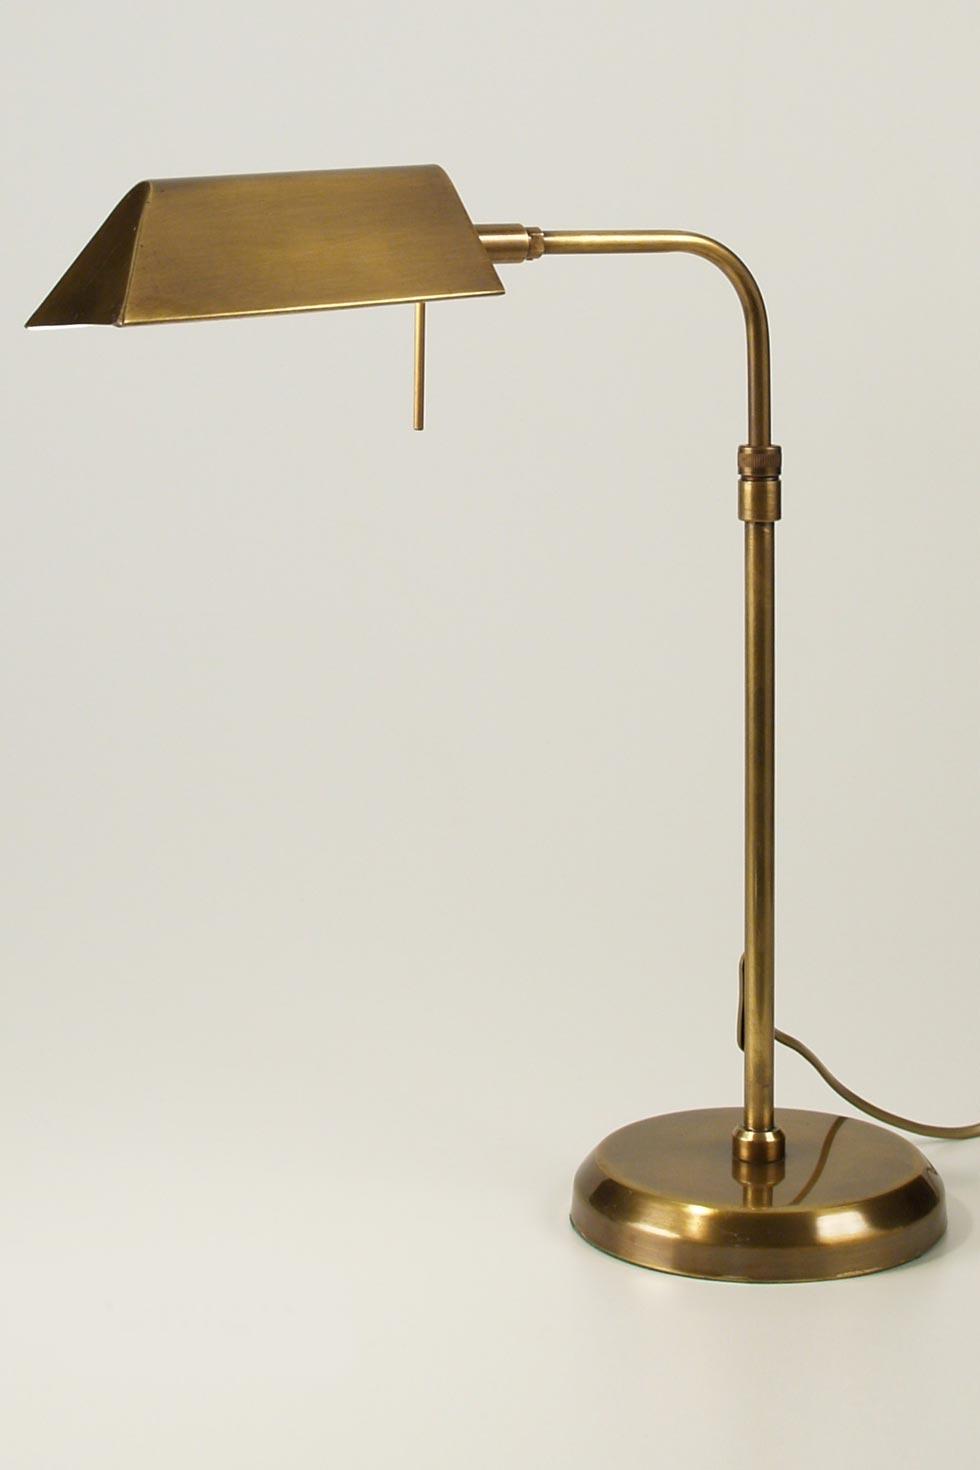 cm28 lampe de table laiton vieilli latoaria